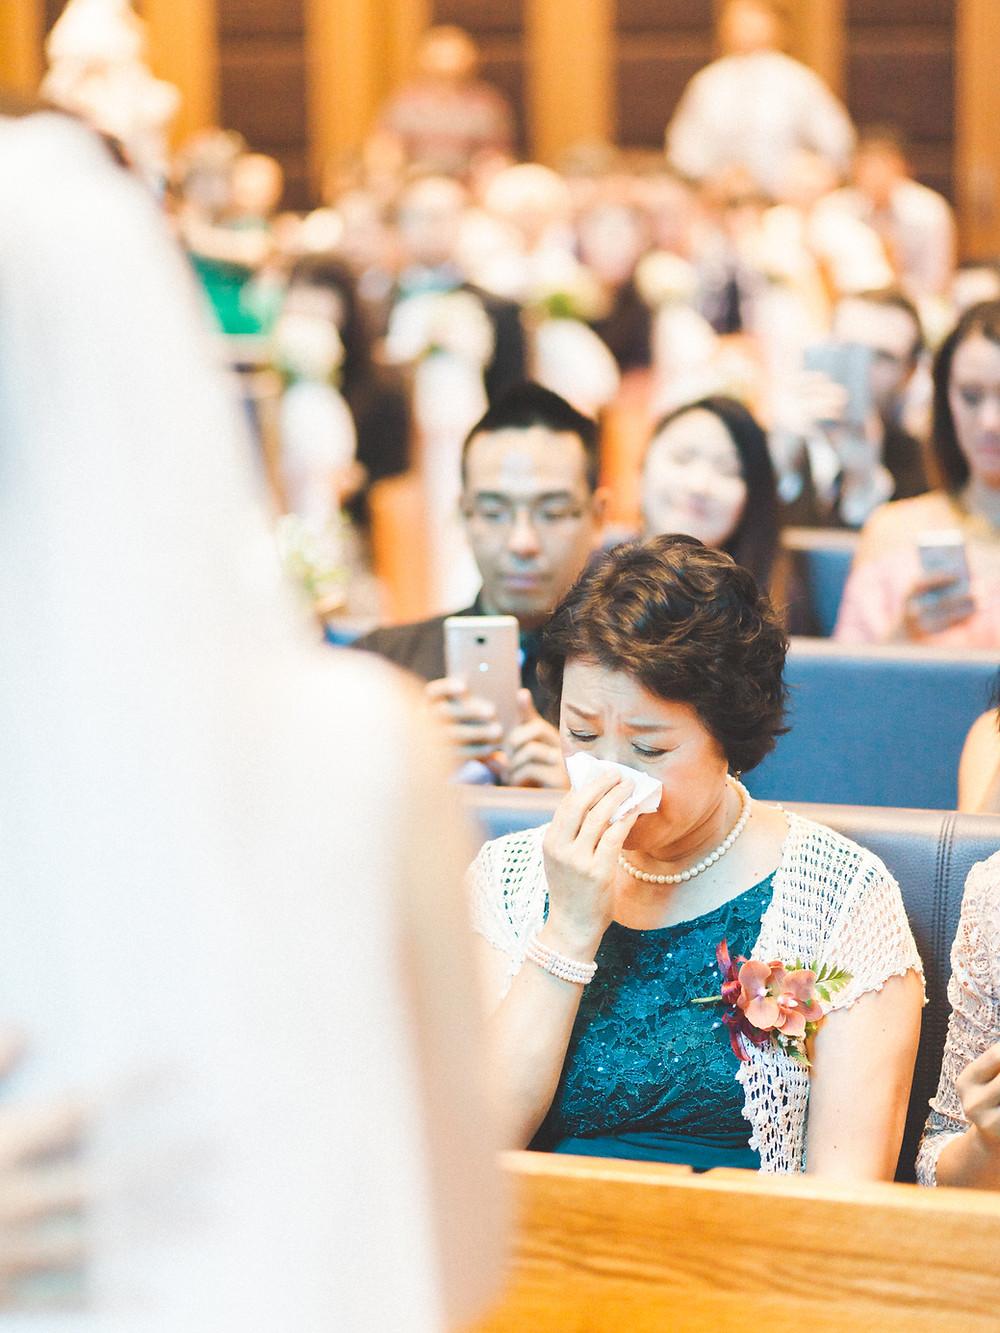 Rachel & MichaelWedding | TAI-AN Presbyterian Church + Arena Banquet Hall Taipei, Taiwan 大安長老教會+小巨蛋囍宴軒 Arther Chen Photography 美式婚禮